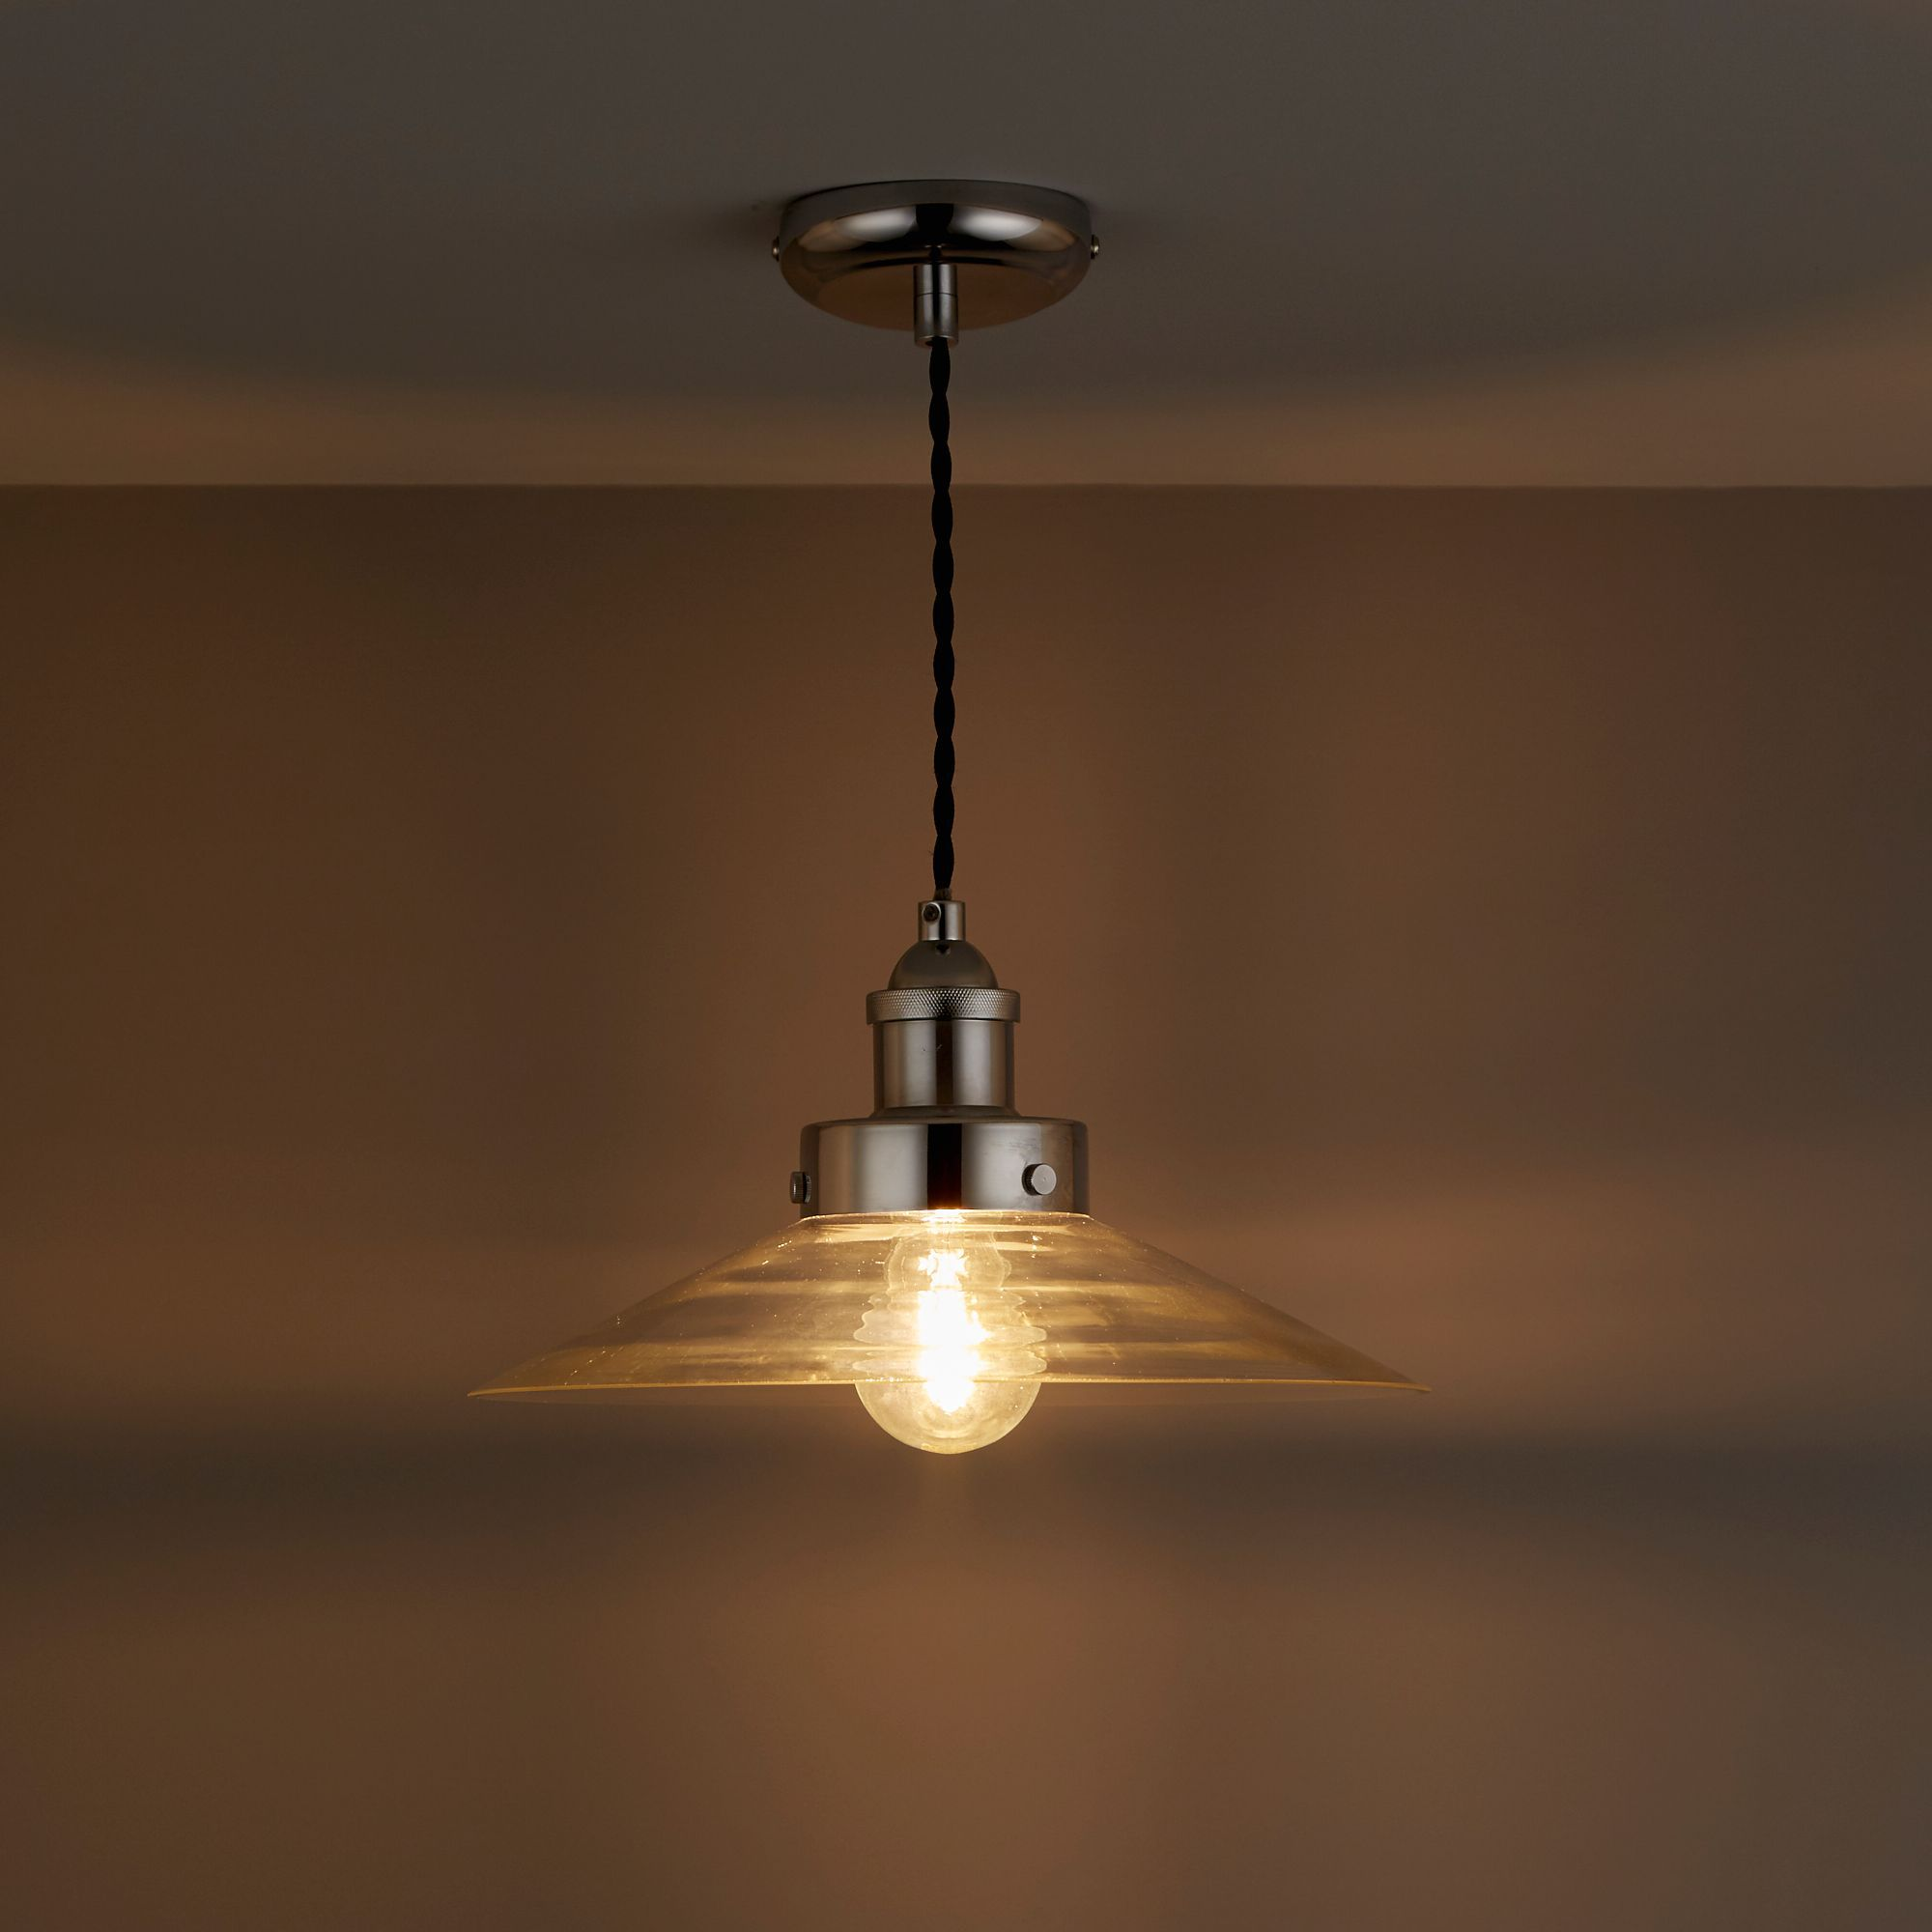 Penny Chrome Effect Pendant Ceiling Light   Departments